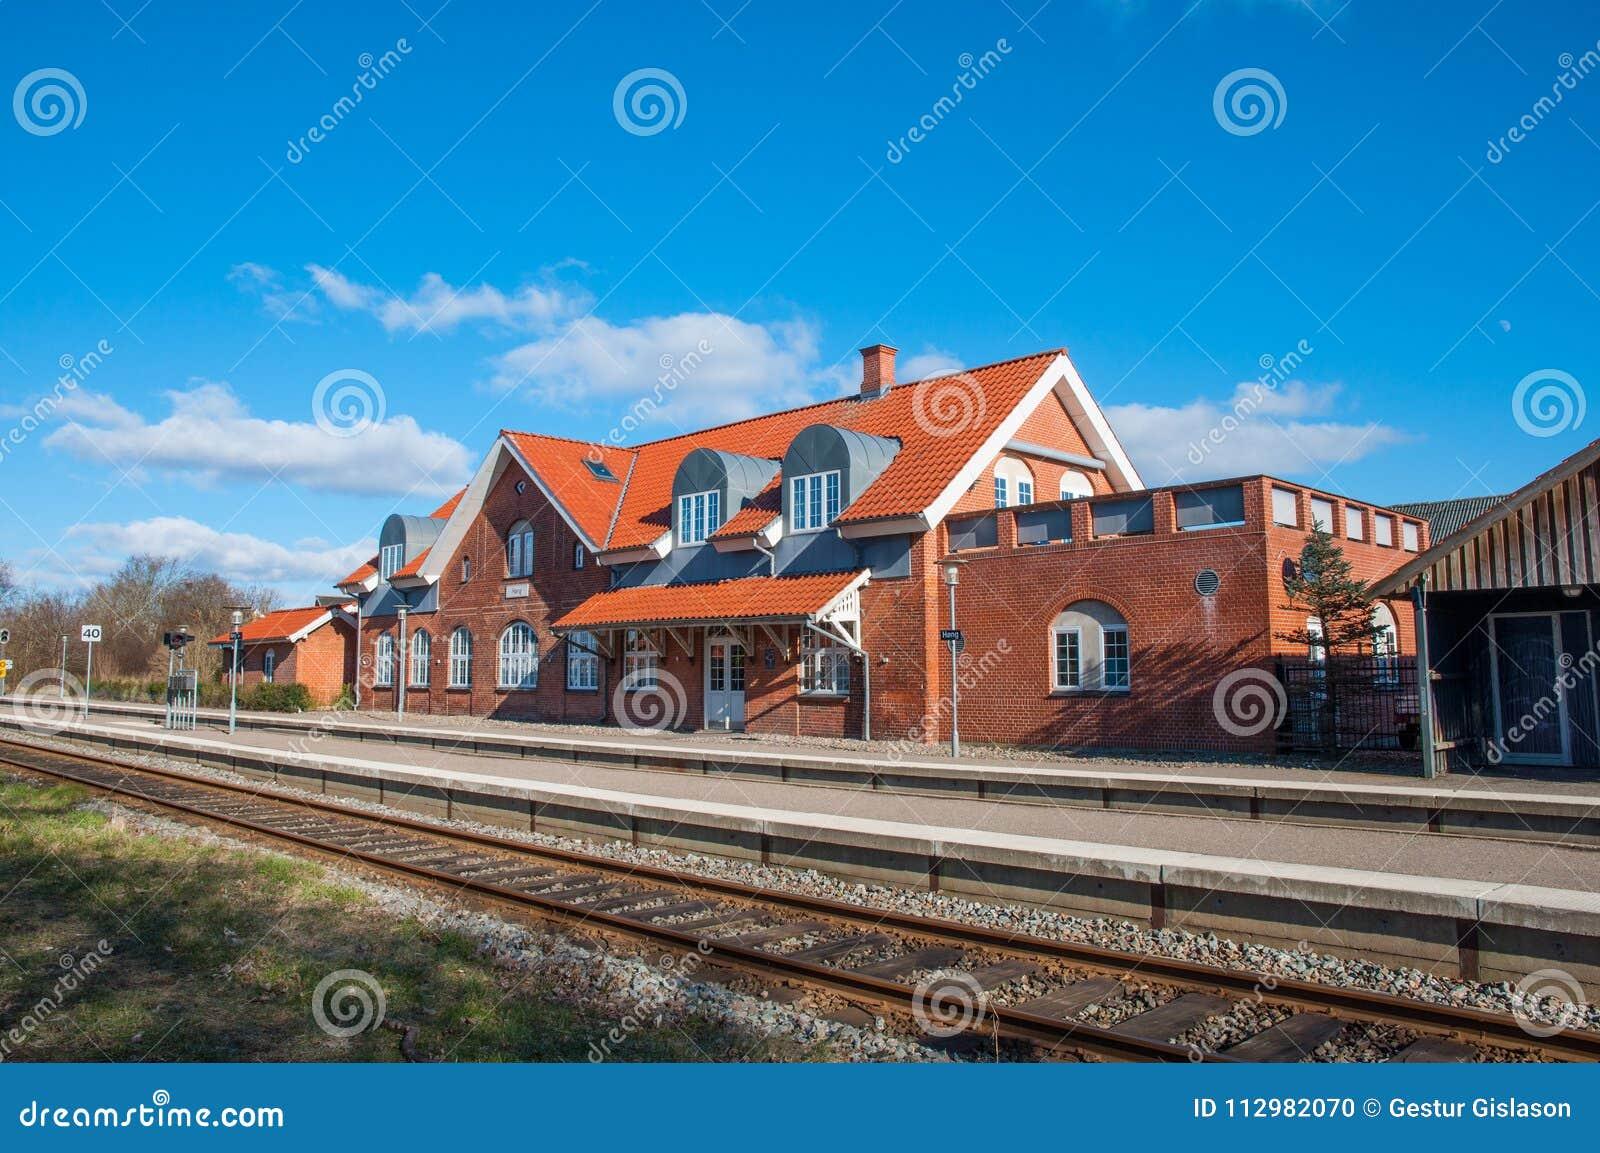 Hoeng train station